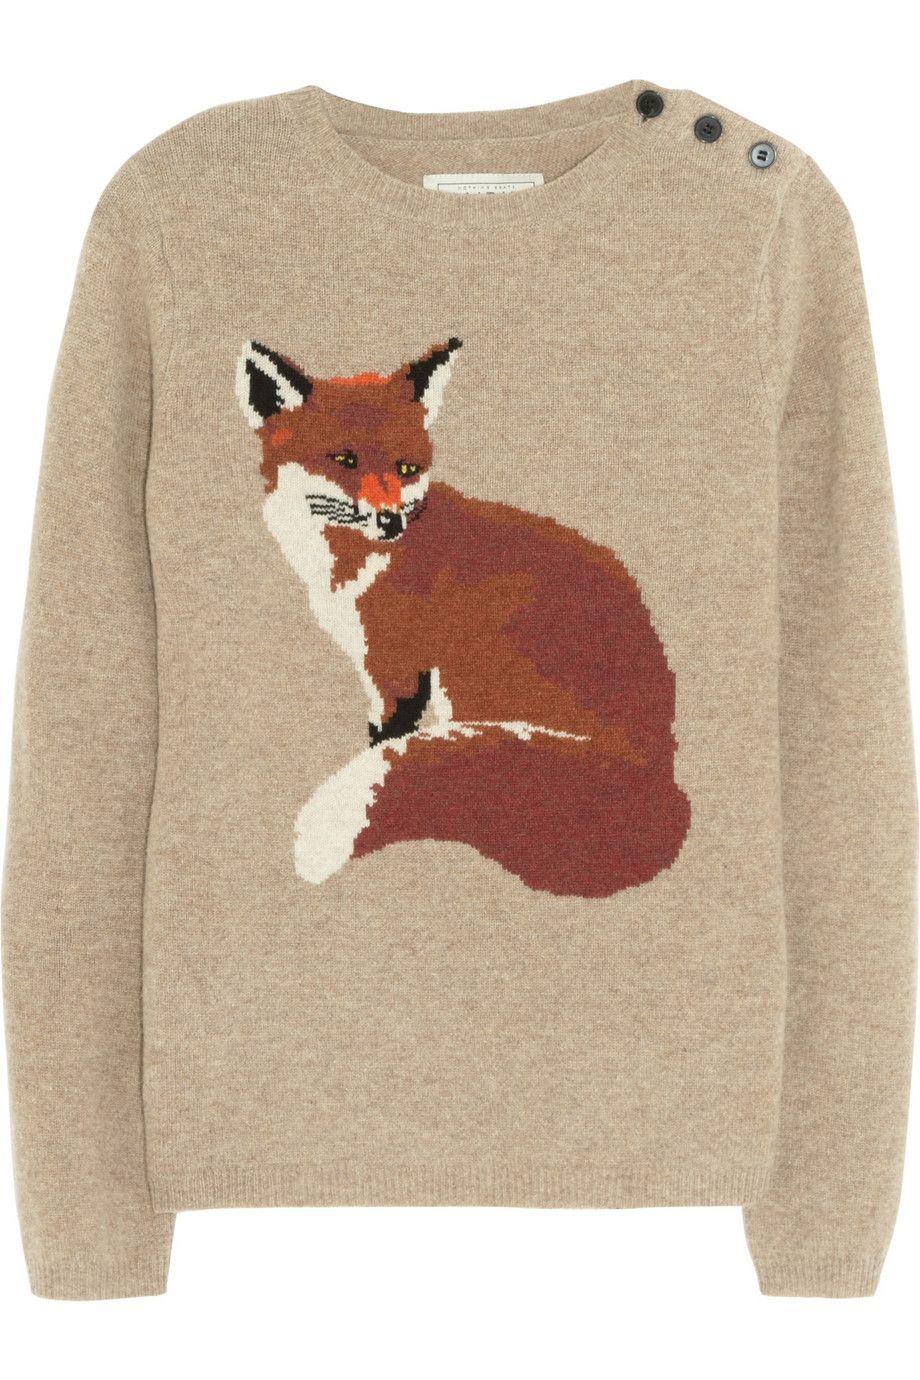 3d625cff1eac Aubin & Wills | Portland fox-intarsia wool sweater | NET-A-PORTER.COM  Amazing and amazingly expensive